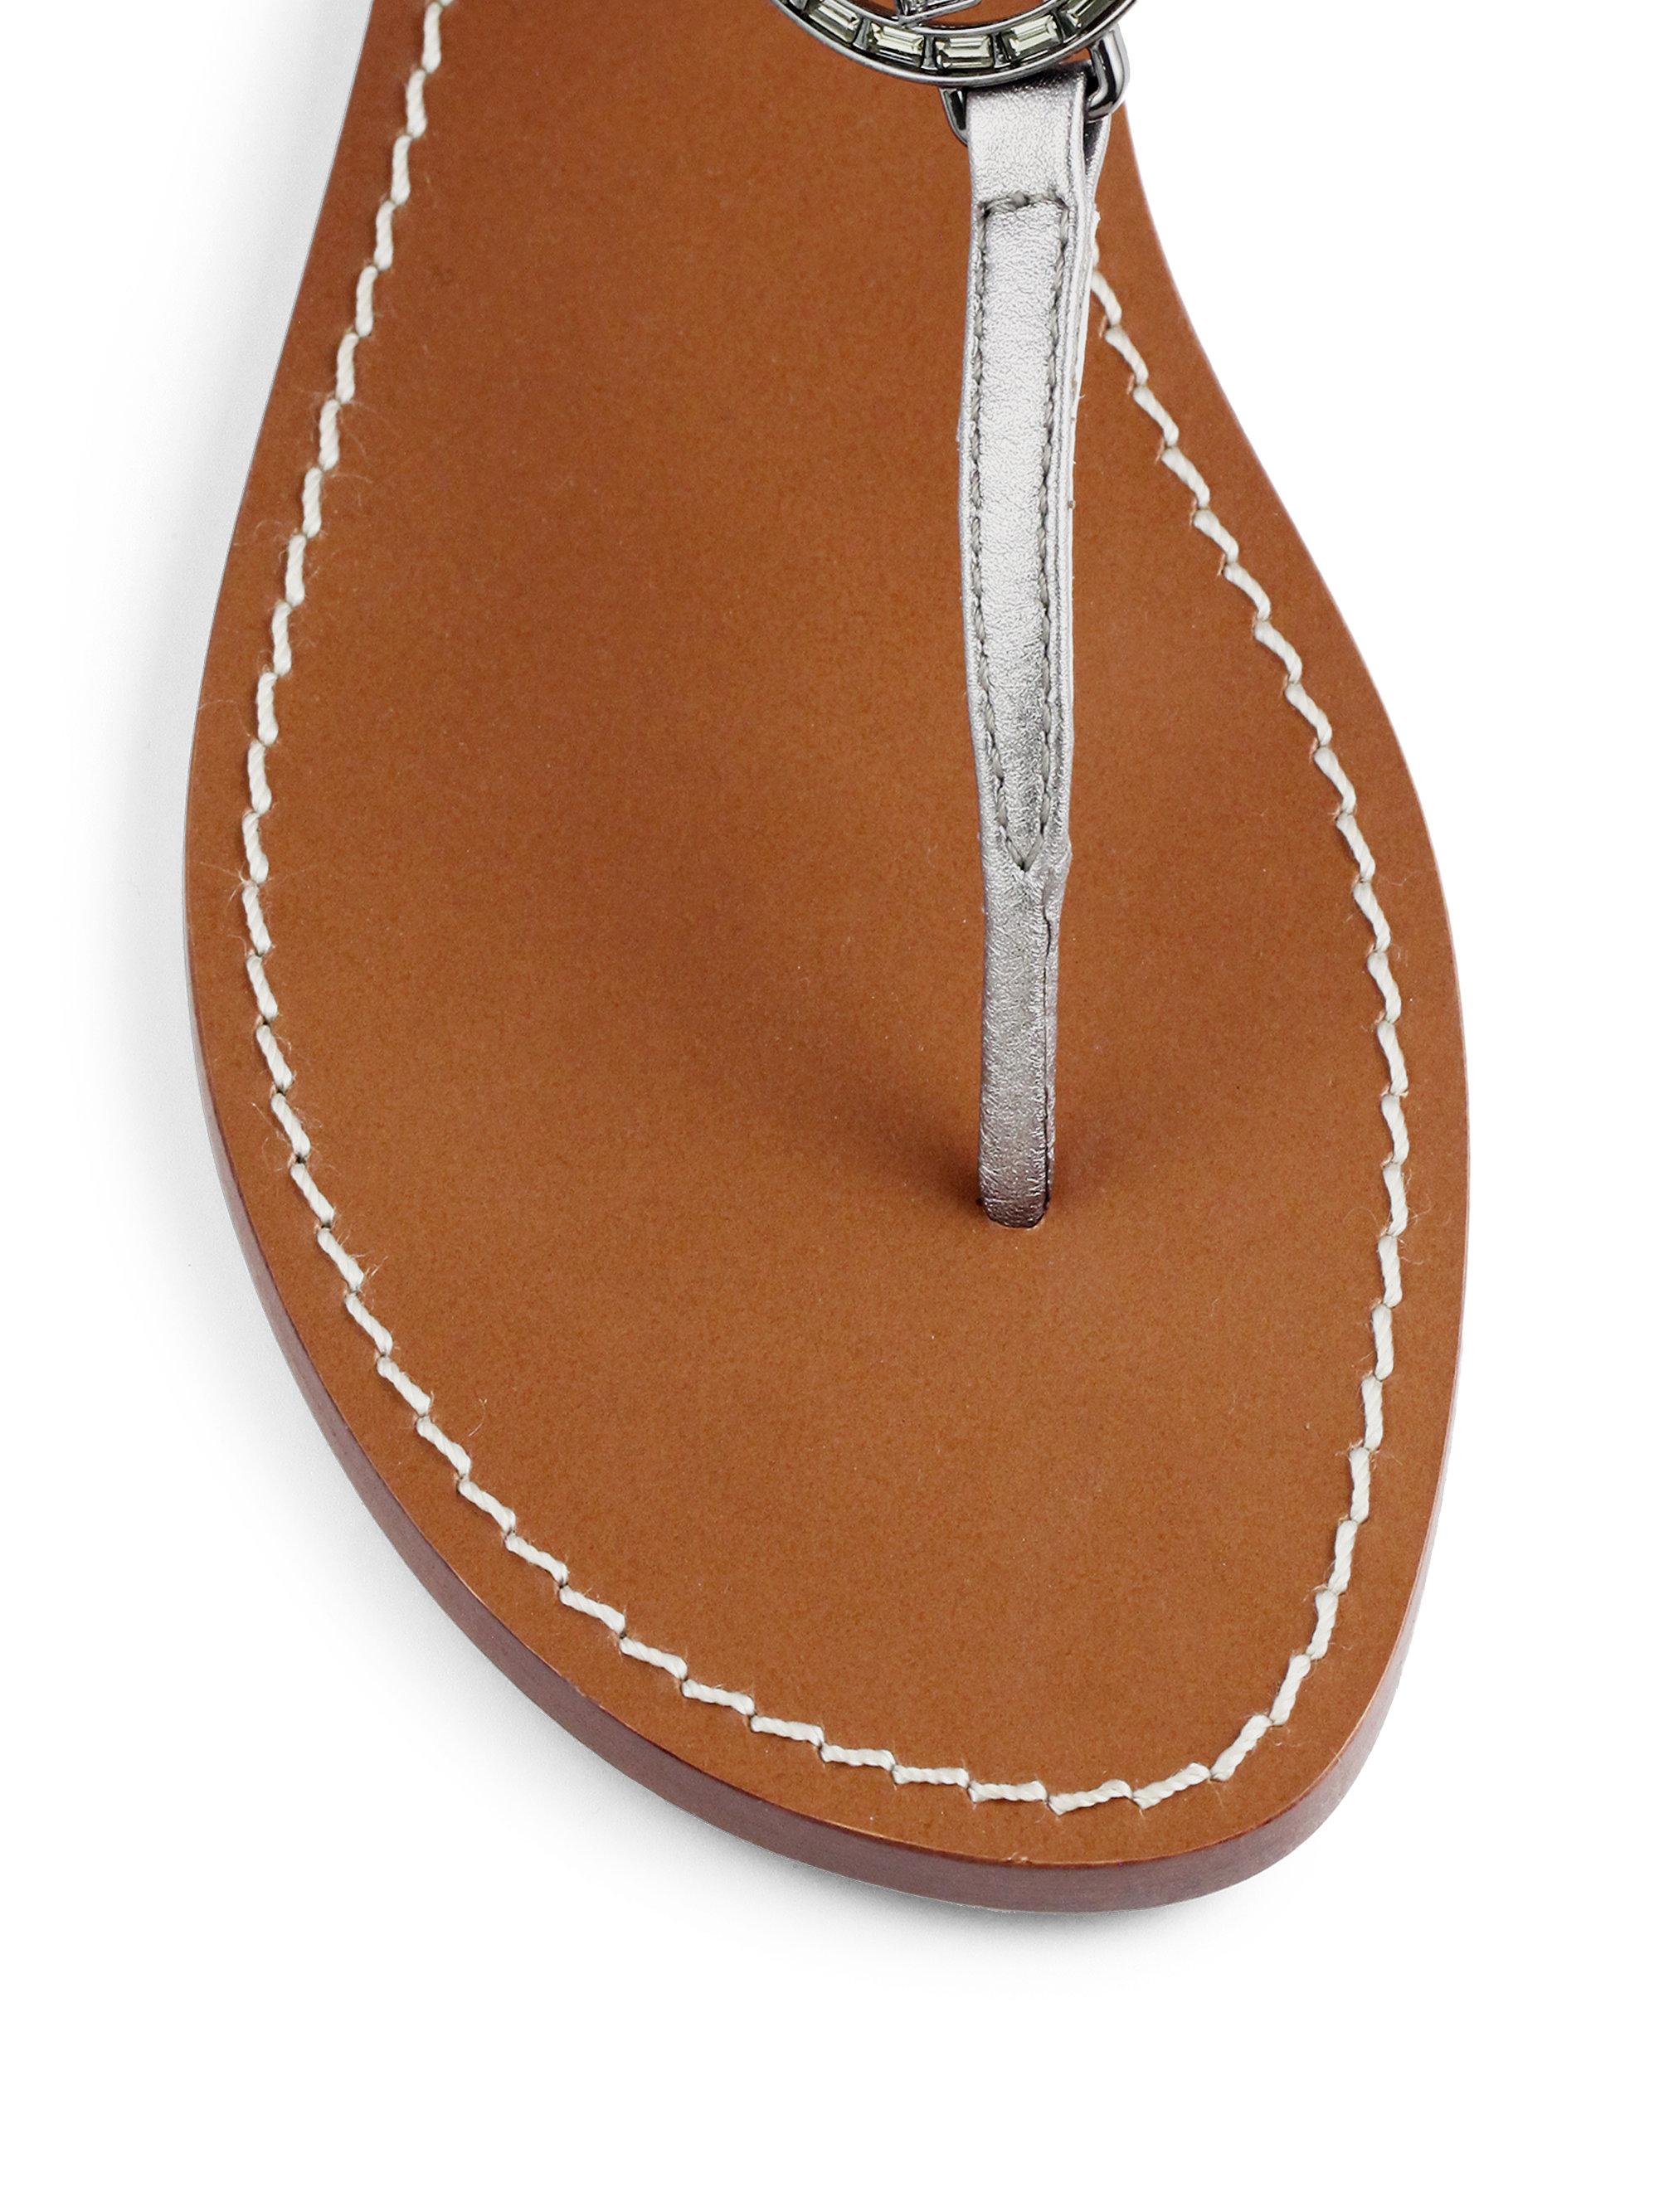 7f4b4e657ac Lyst - Tory Burch Violet Metallic Leather Thong Sandals in Metallic